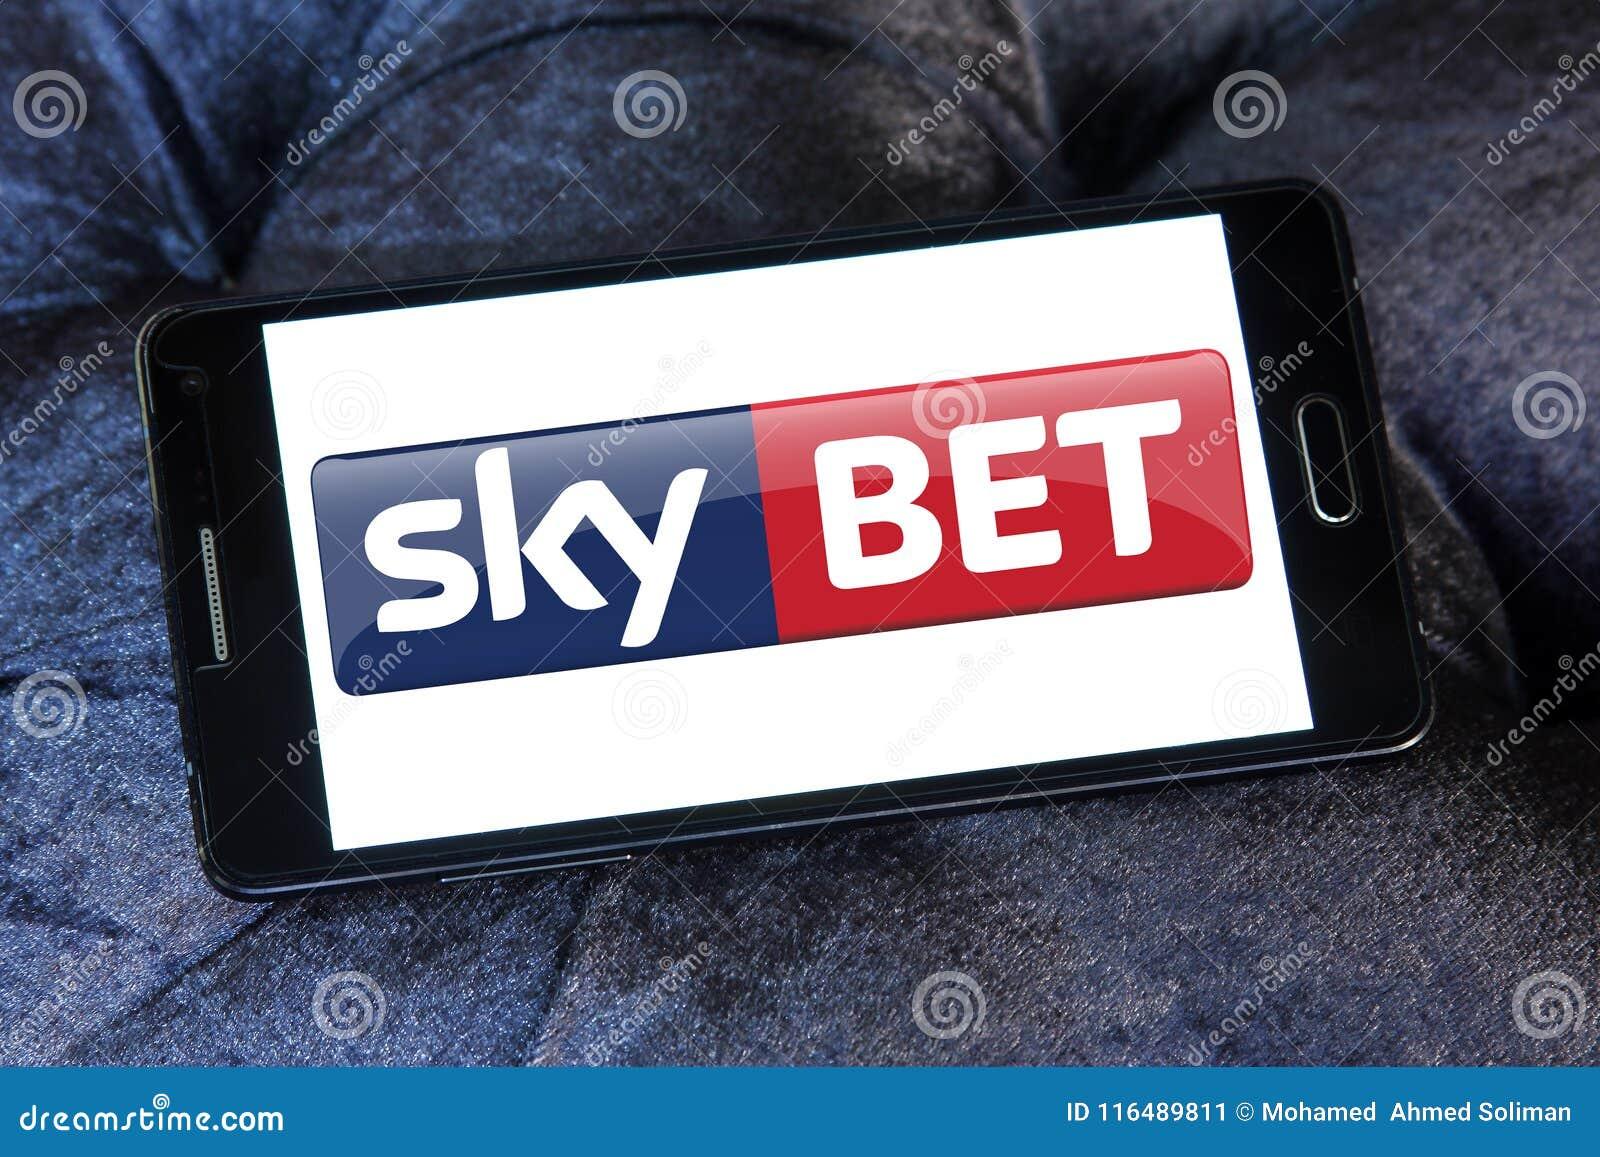 Sky Bet Betting & Gaming Company Logo Editorial Photo